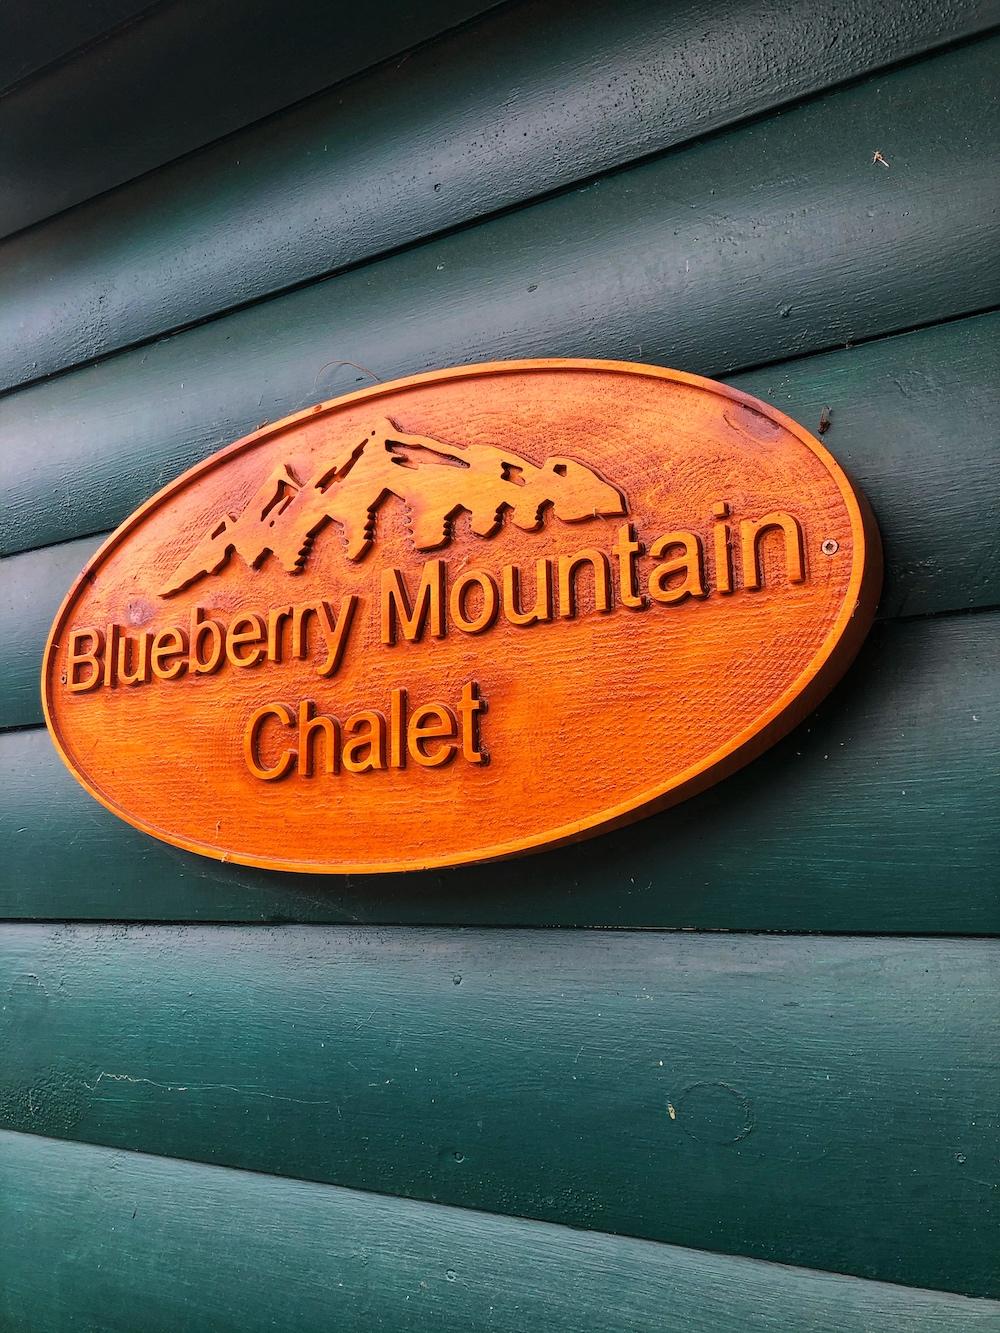 Blueberry Mountain Chalet